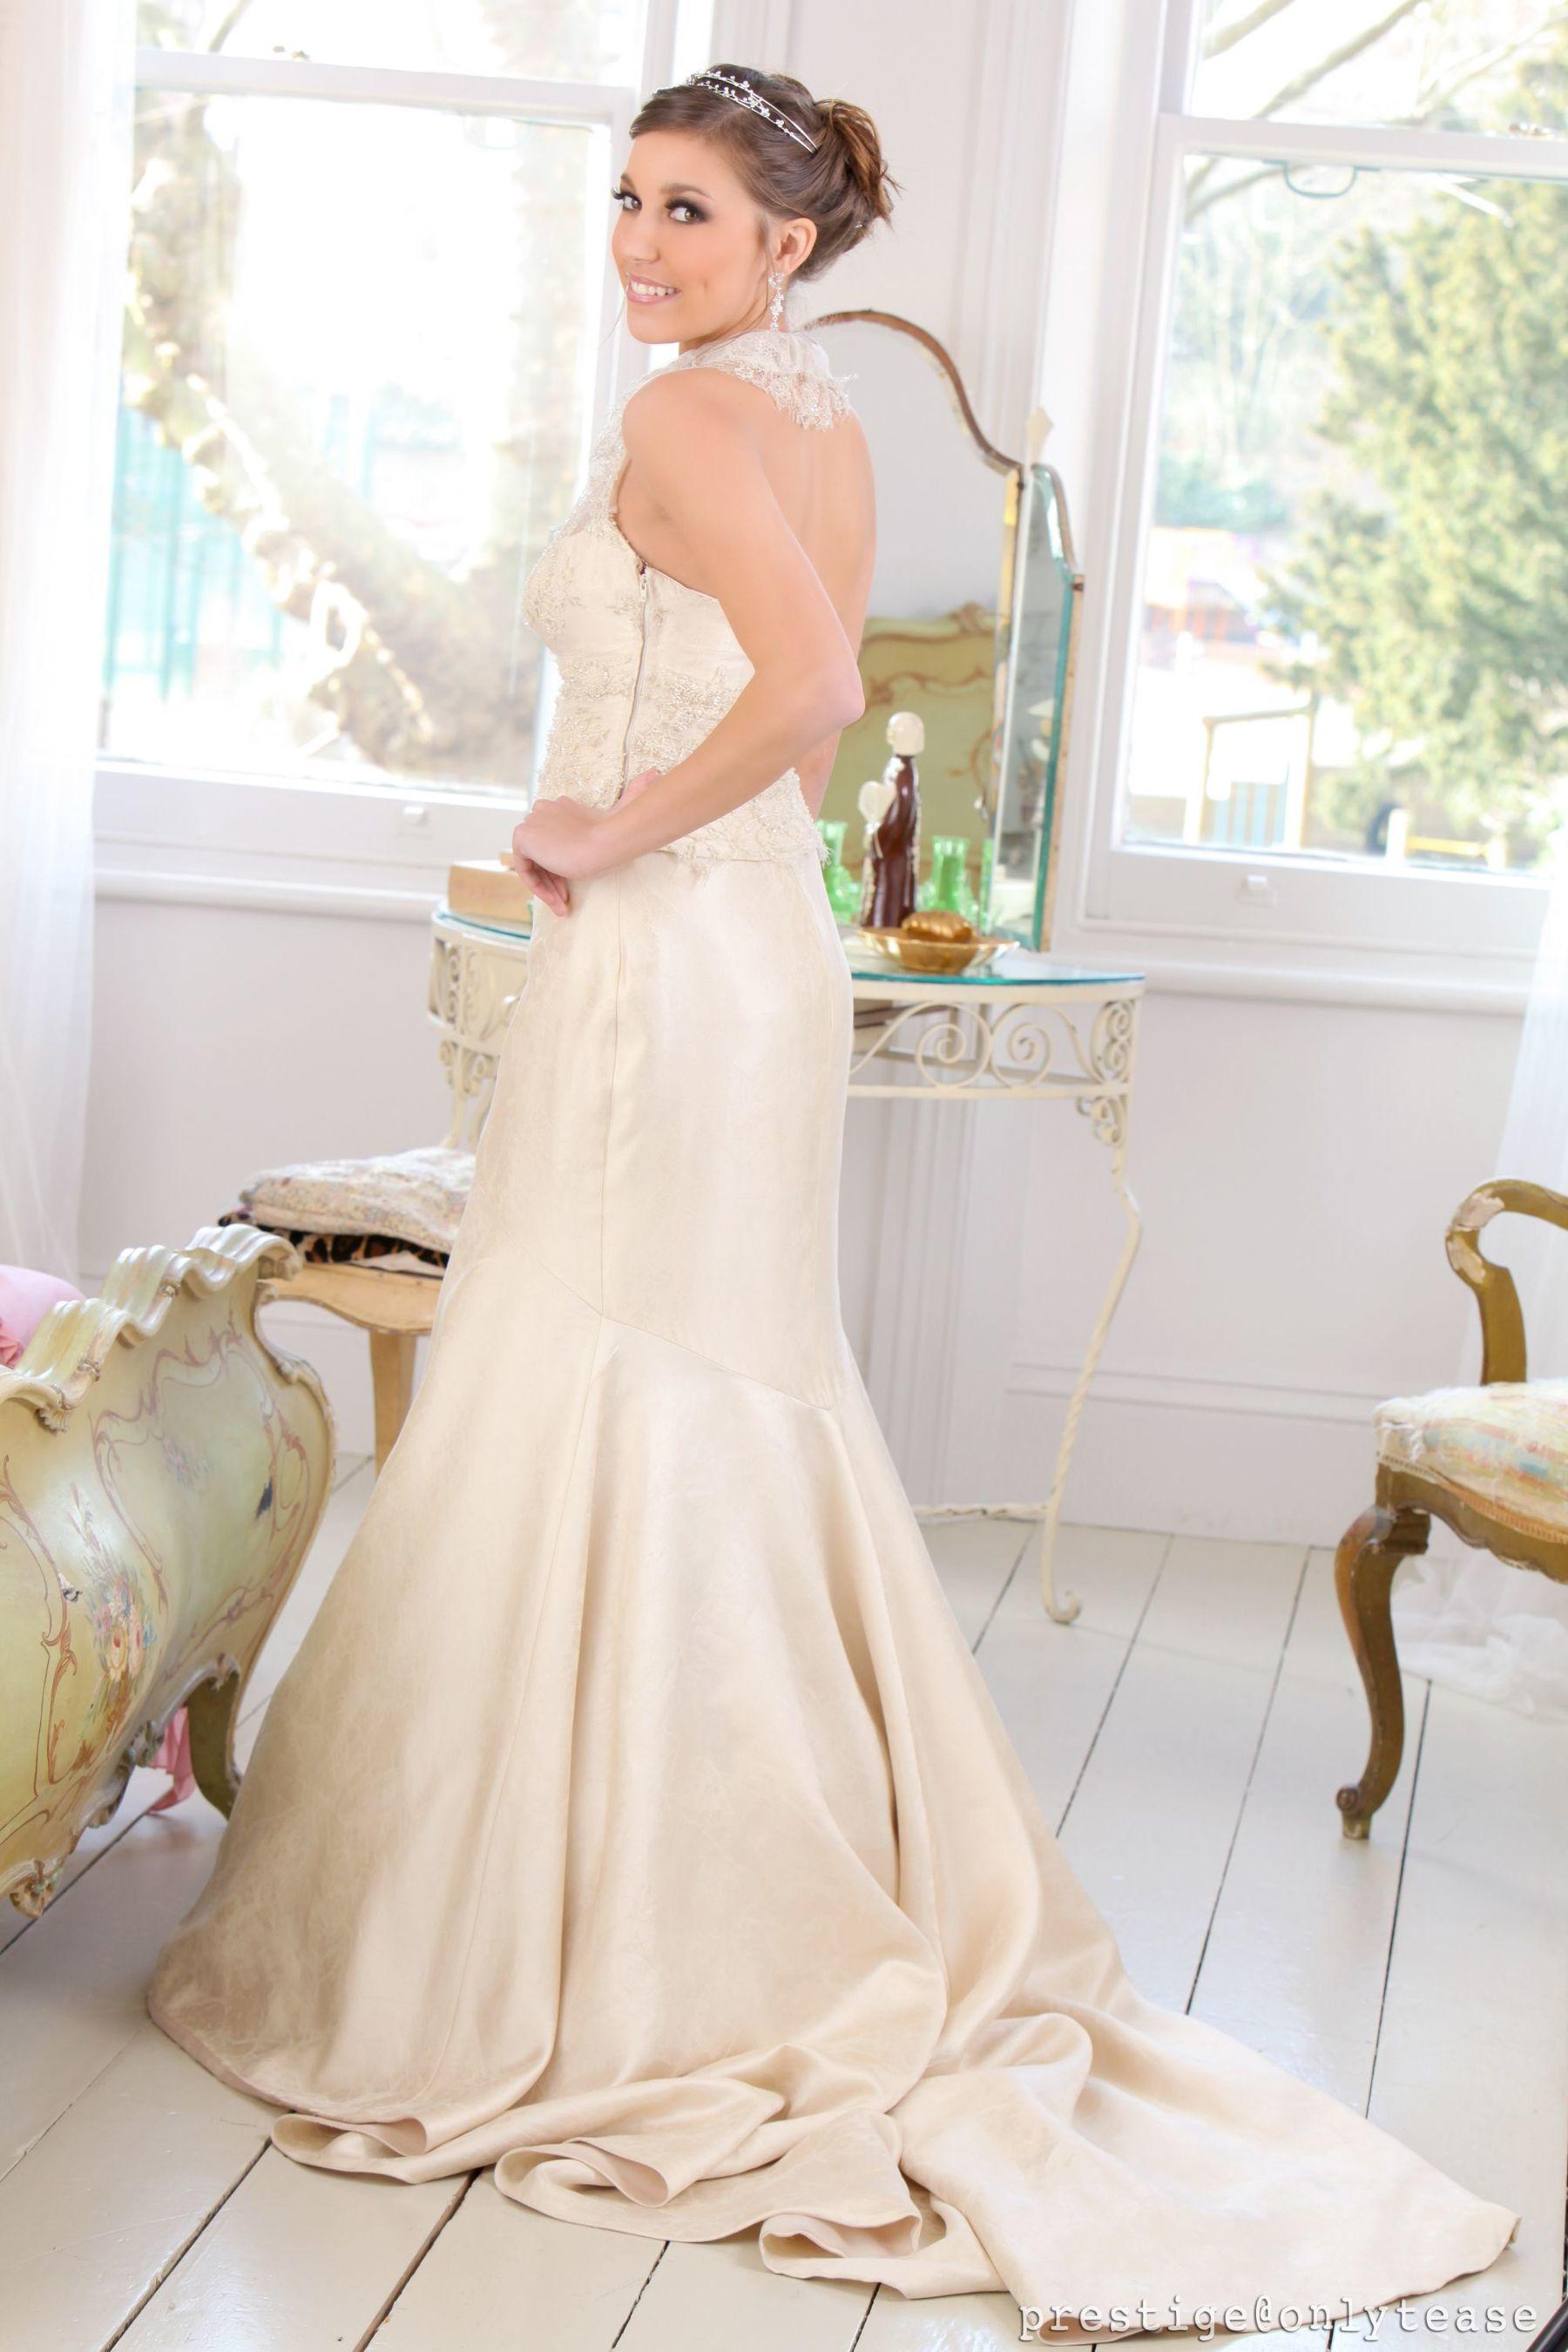 VOL.879 [OnlyTease] Ava Watts 婚纱诱惑超高清写真图片